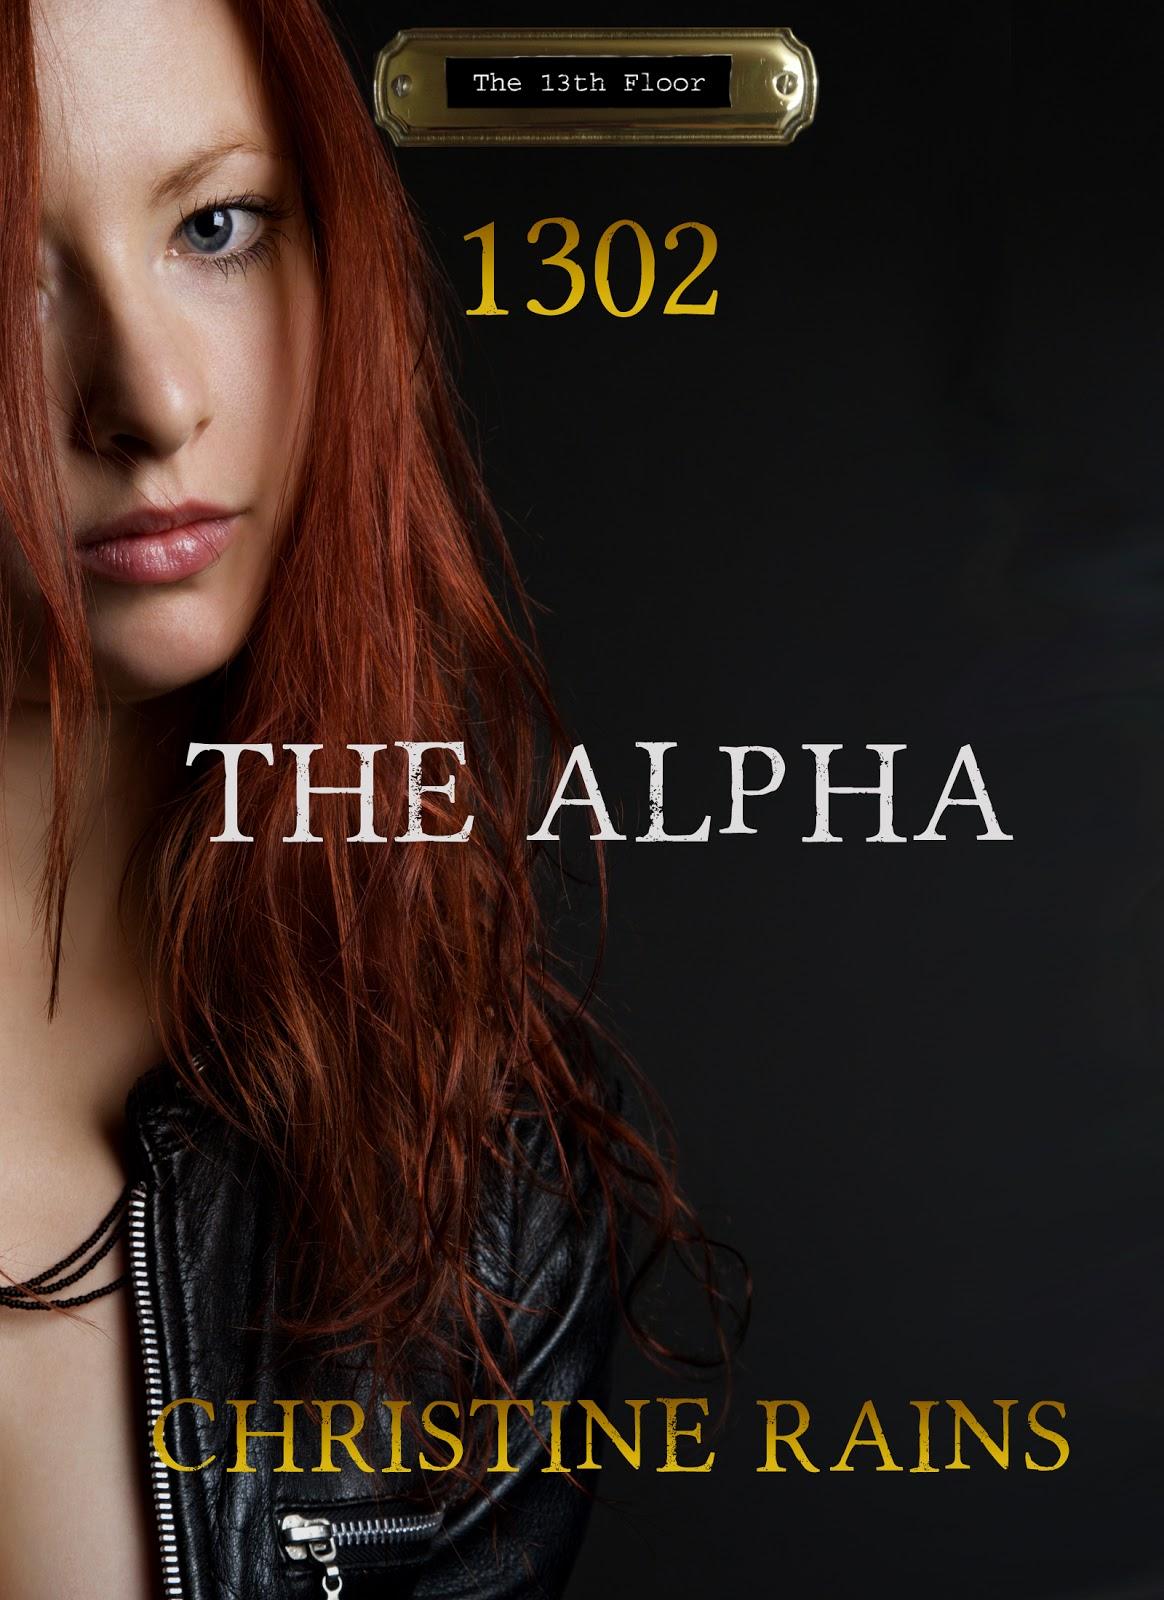 Christine rains writer the 13th floor series 1302 the alpha tyukafo